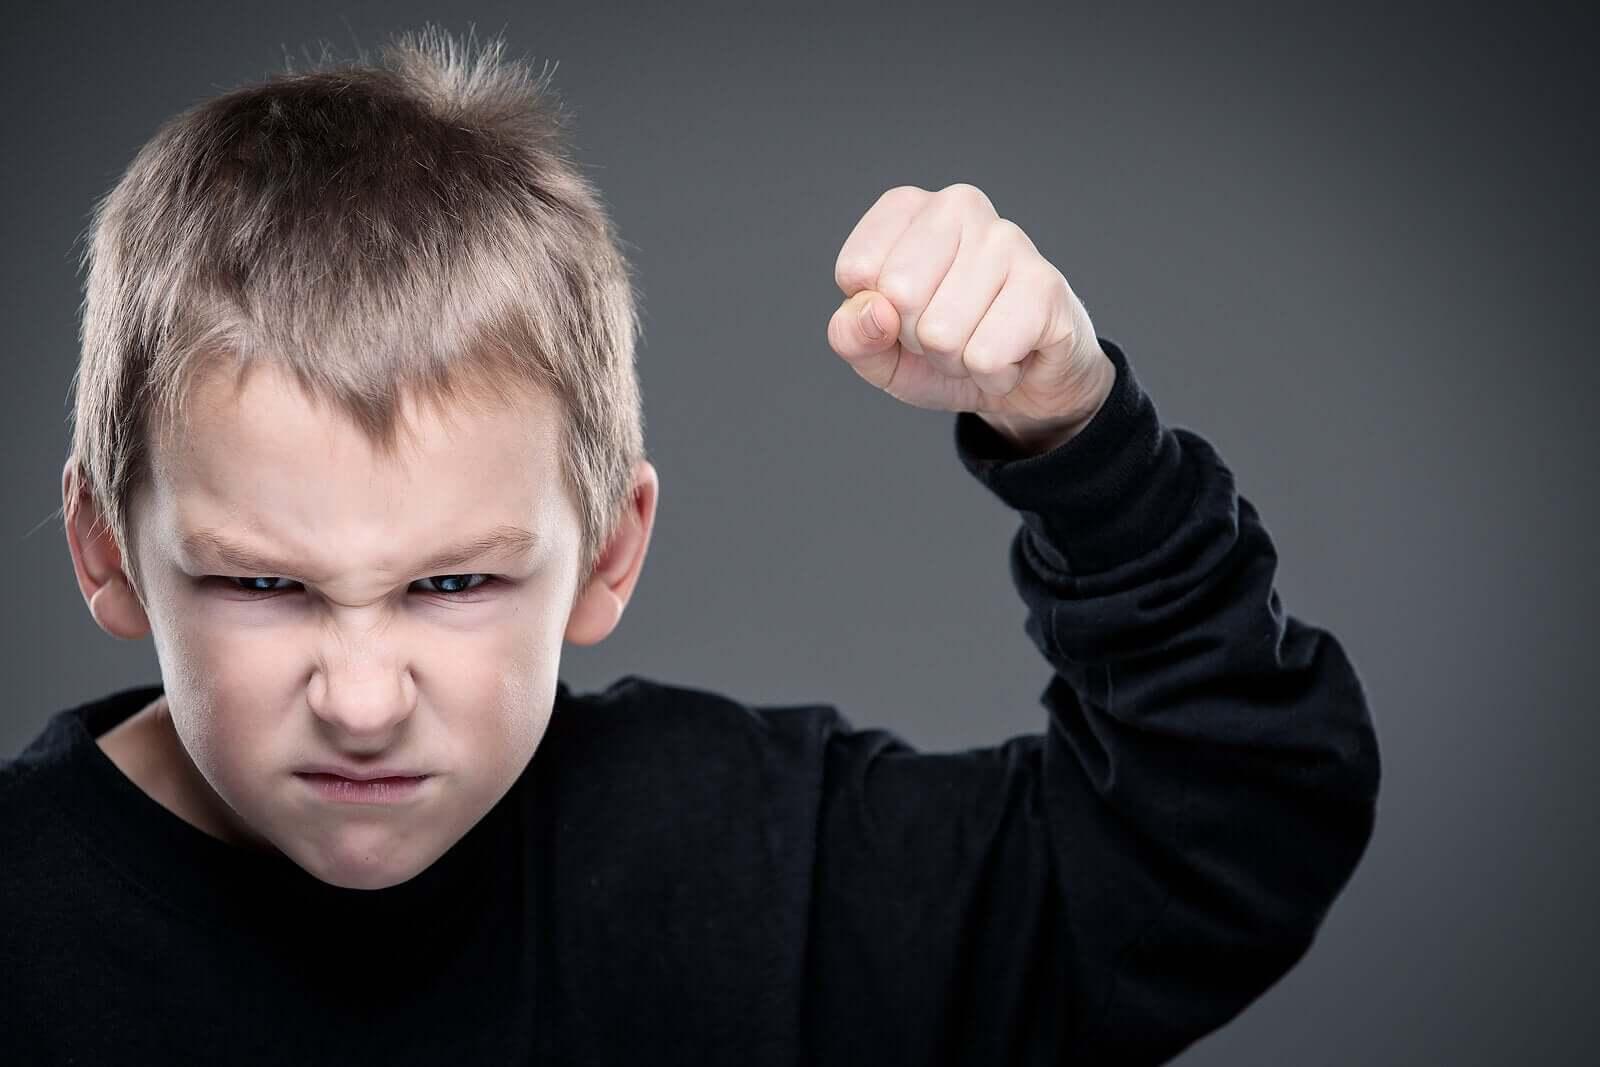 Internalizing and Externalizing Symptoms in Children